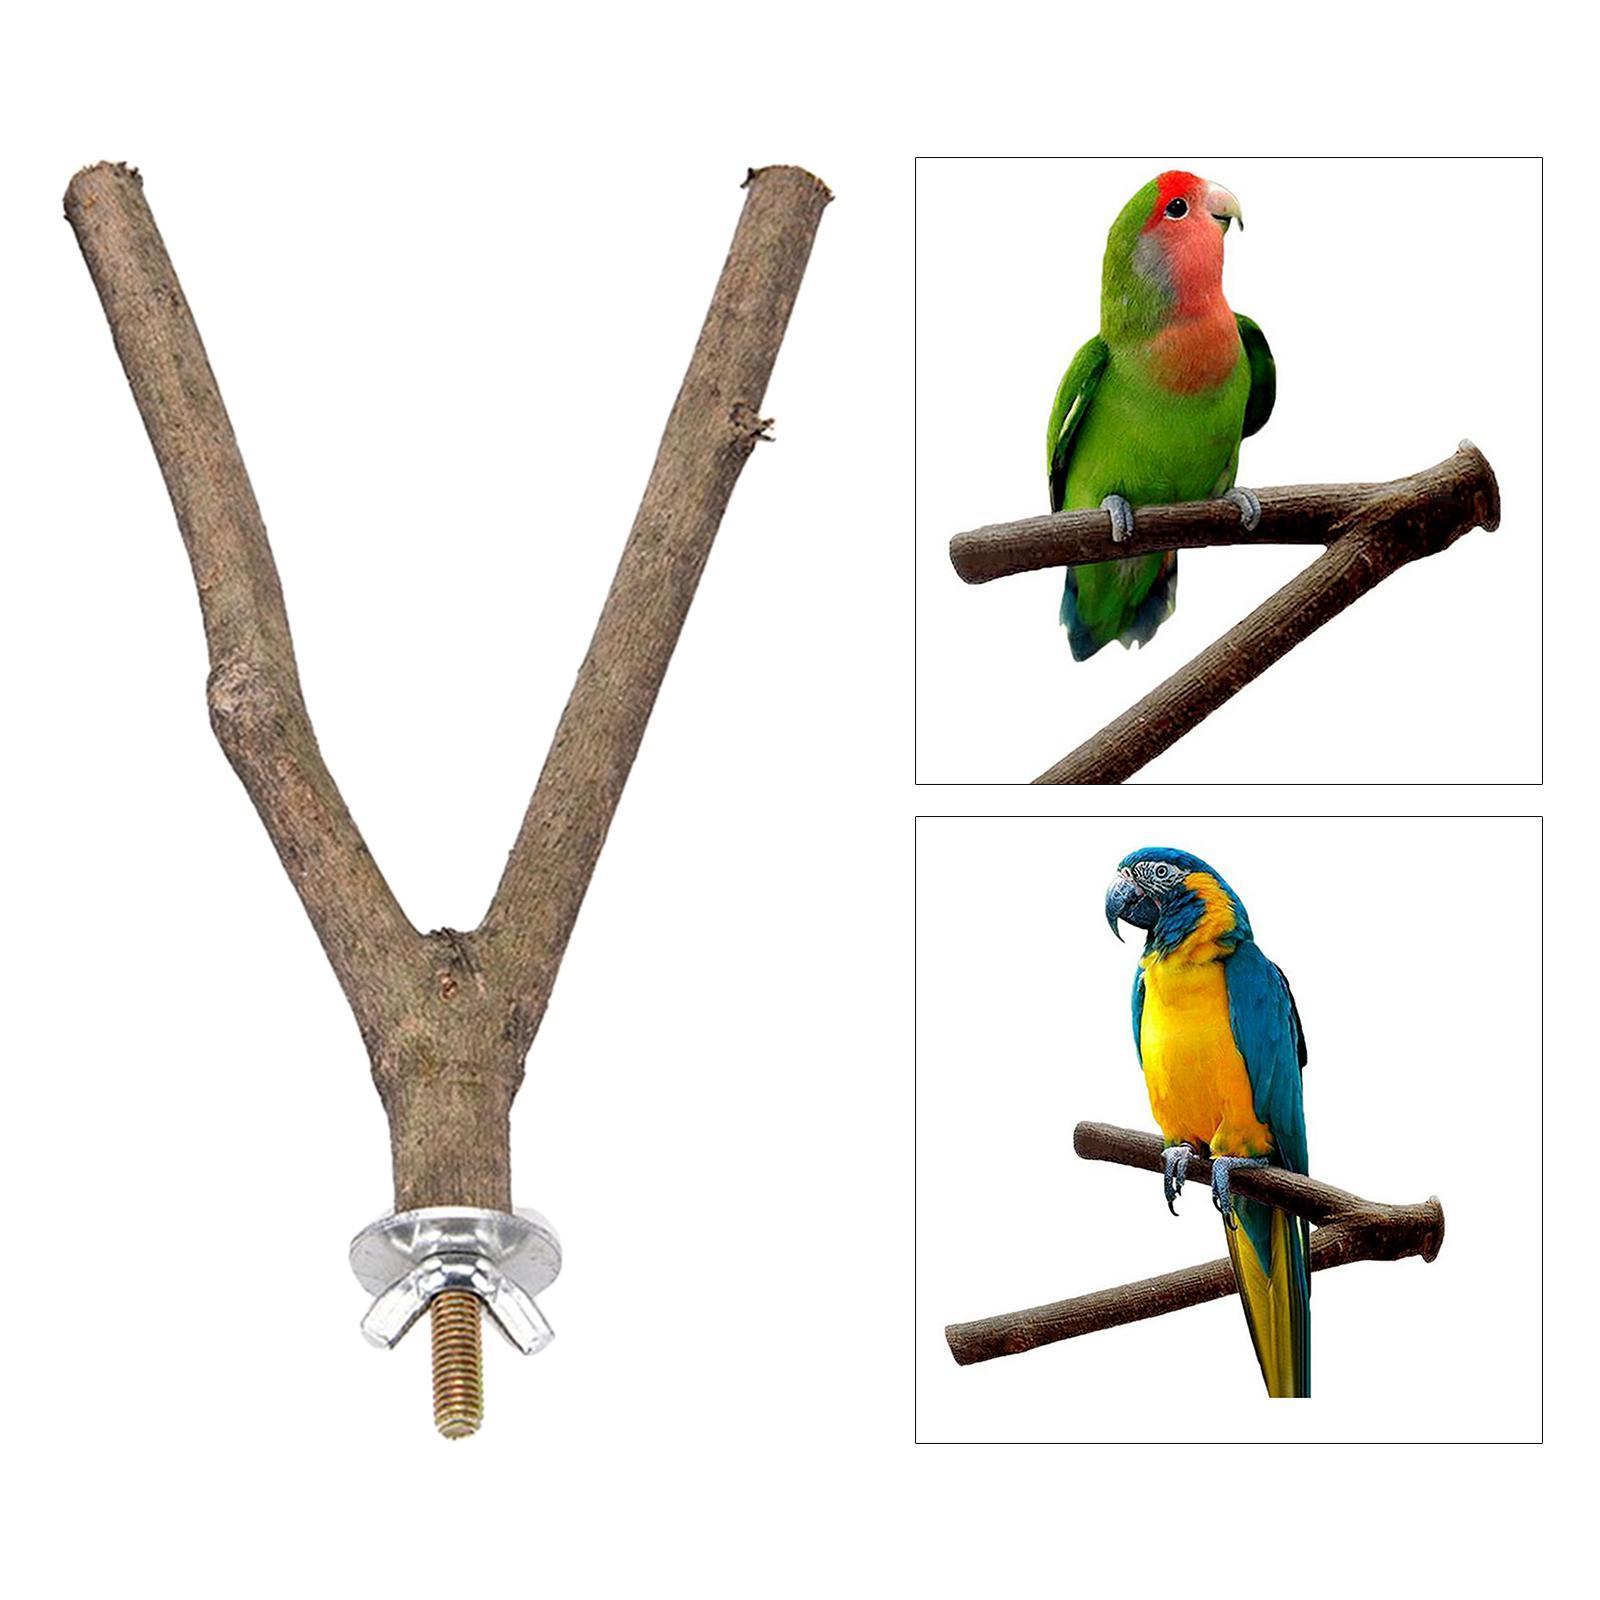 thumbnail 28 - Bird-Perch-Wood-Stand-Bird-Cage-Swing-Branch-for-Parrot-Parakeet-Cockatiel